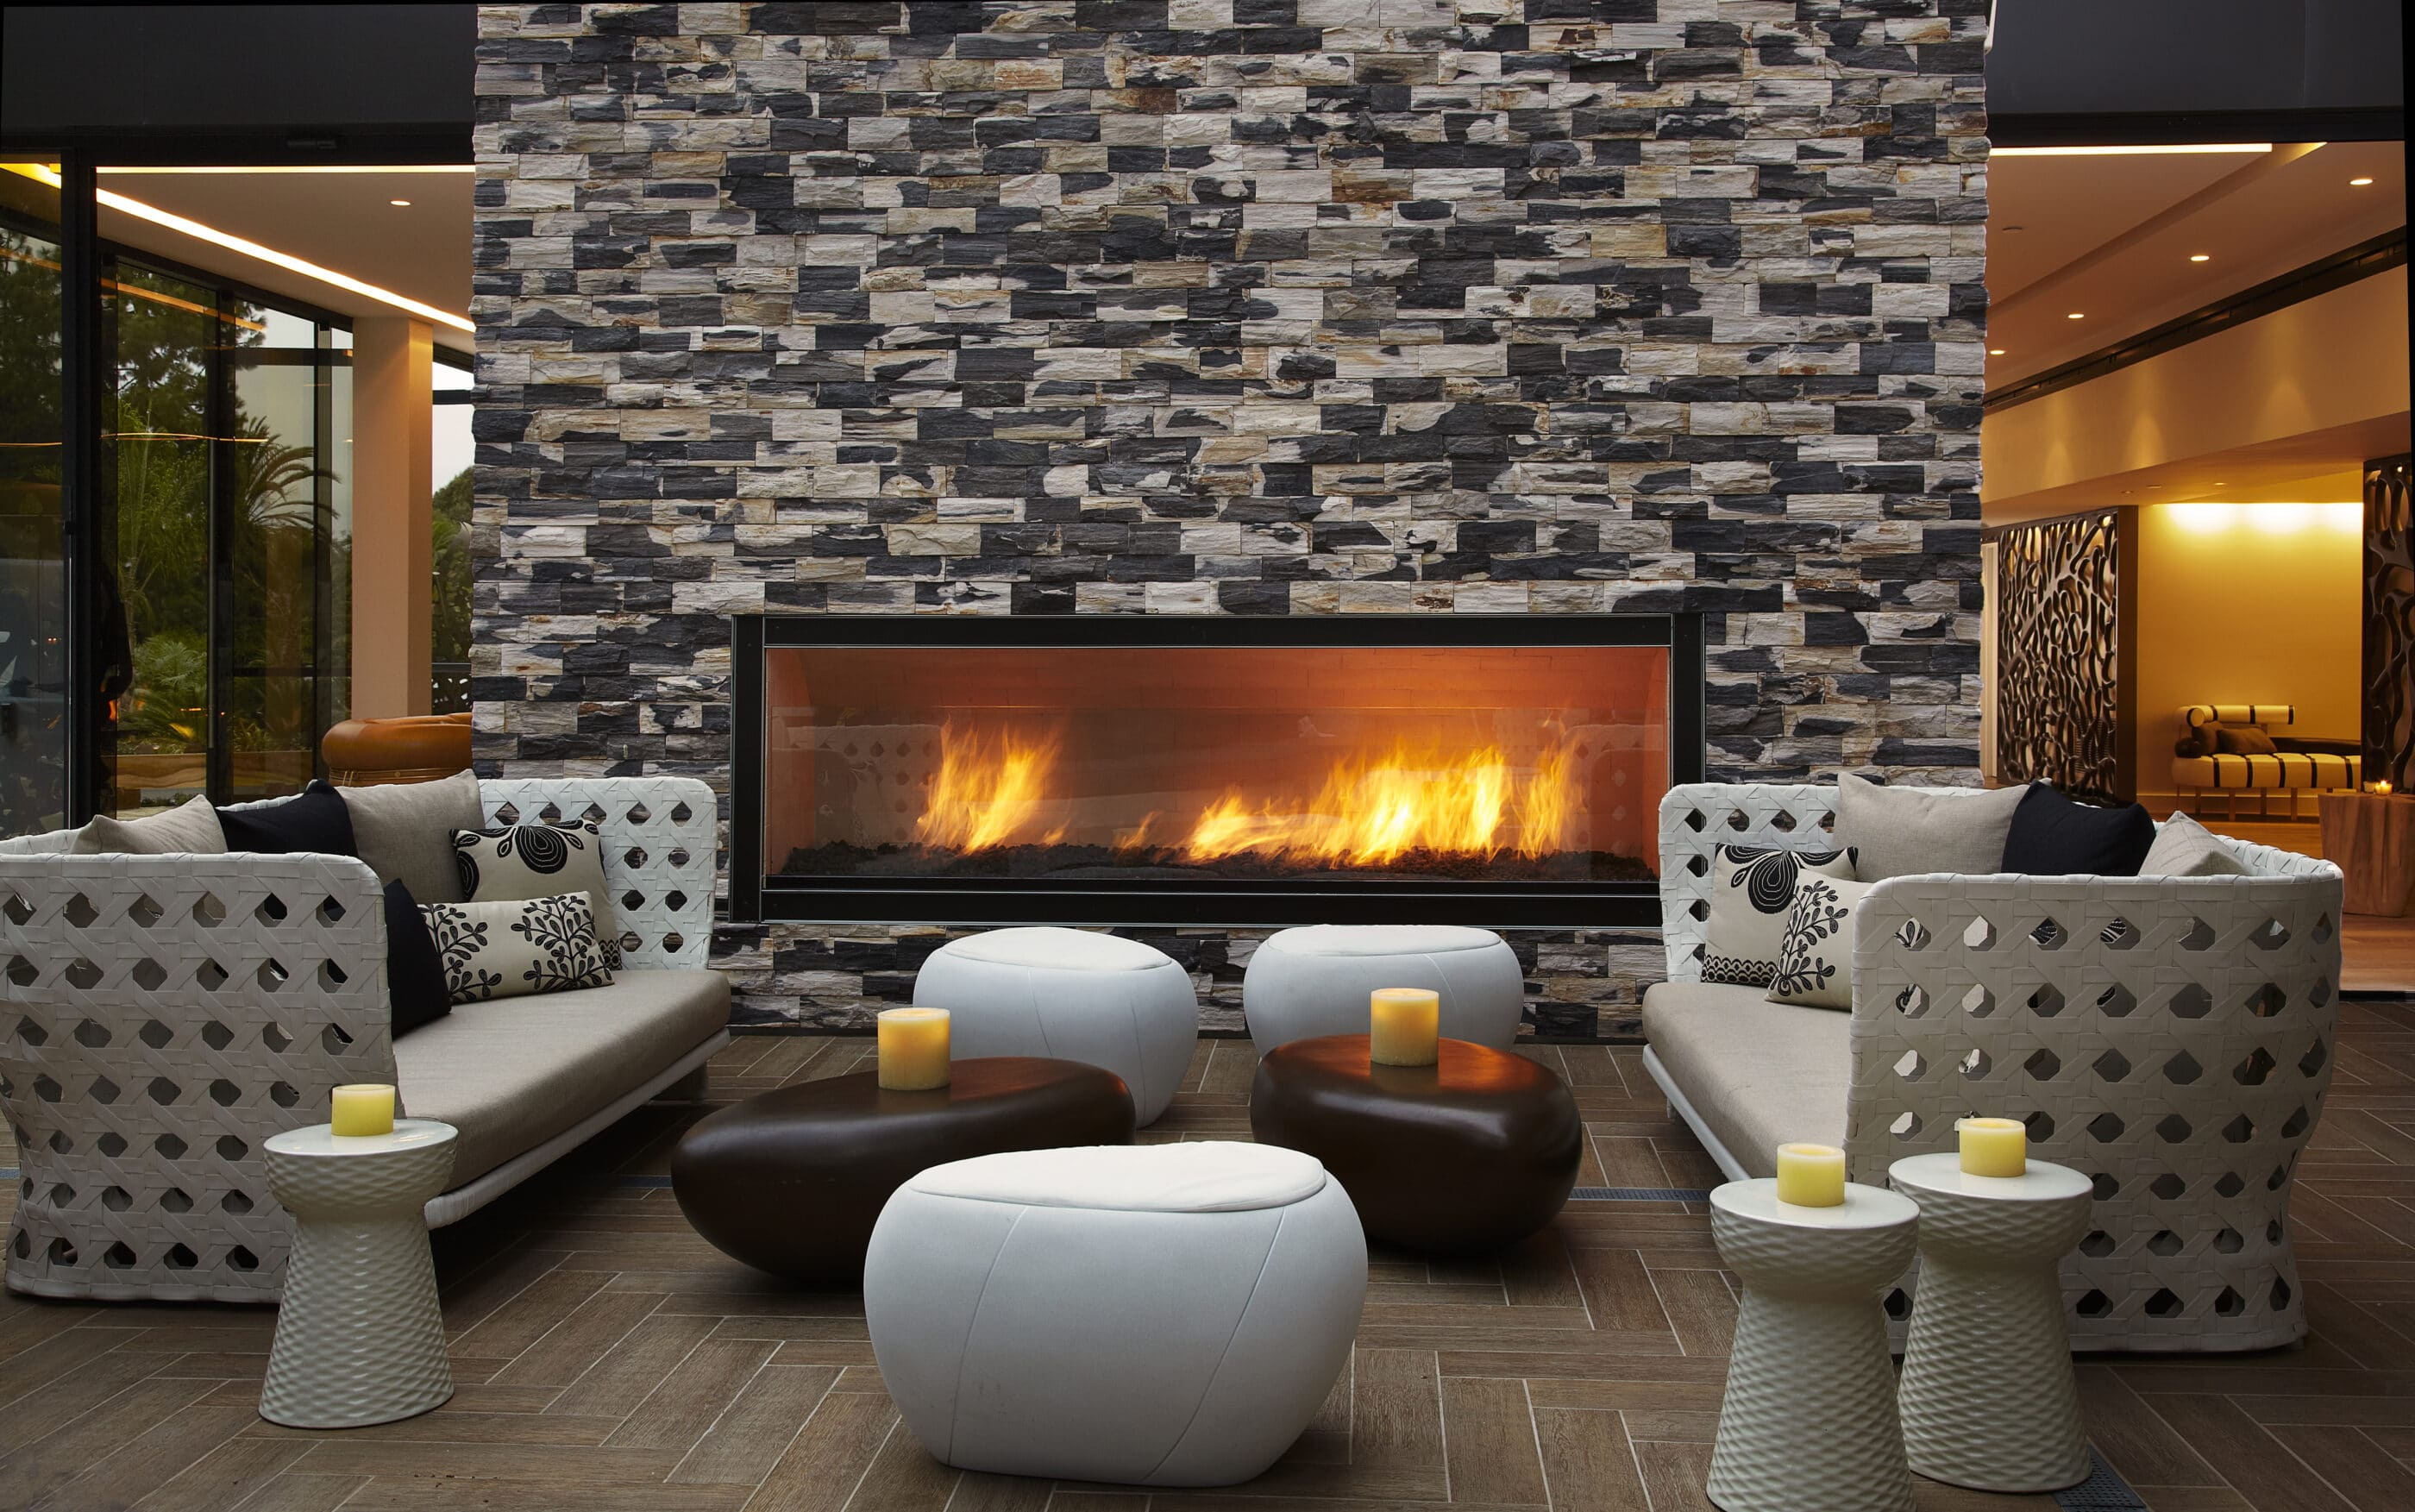 Hotel La Jolla Hiatus lounge seating with fireplace